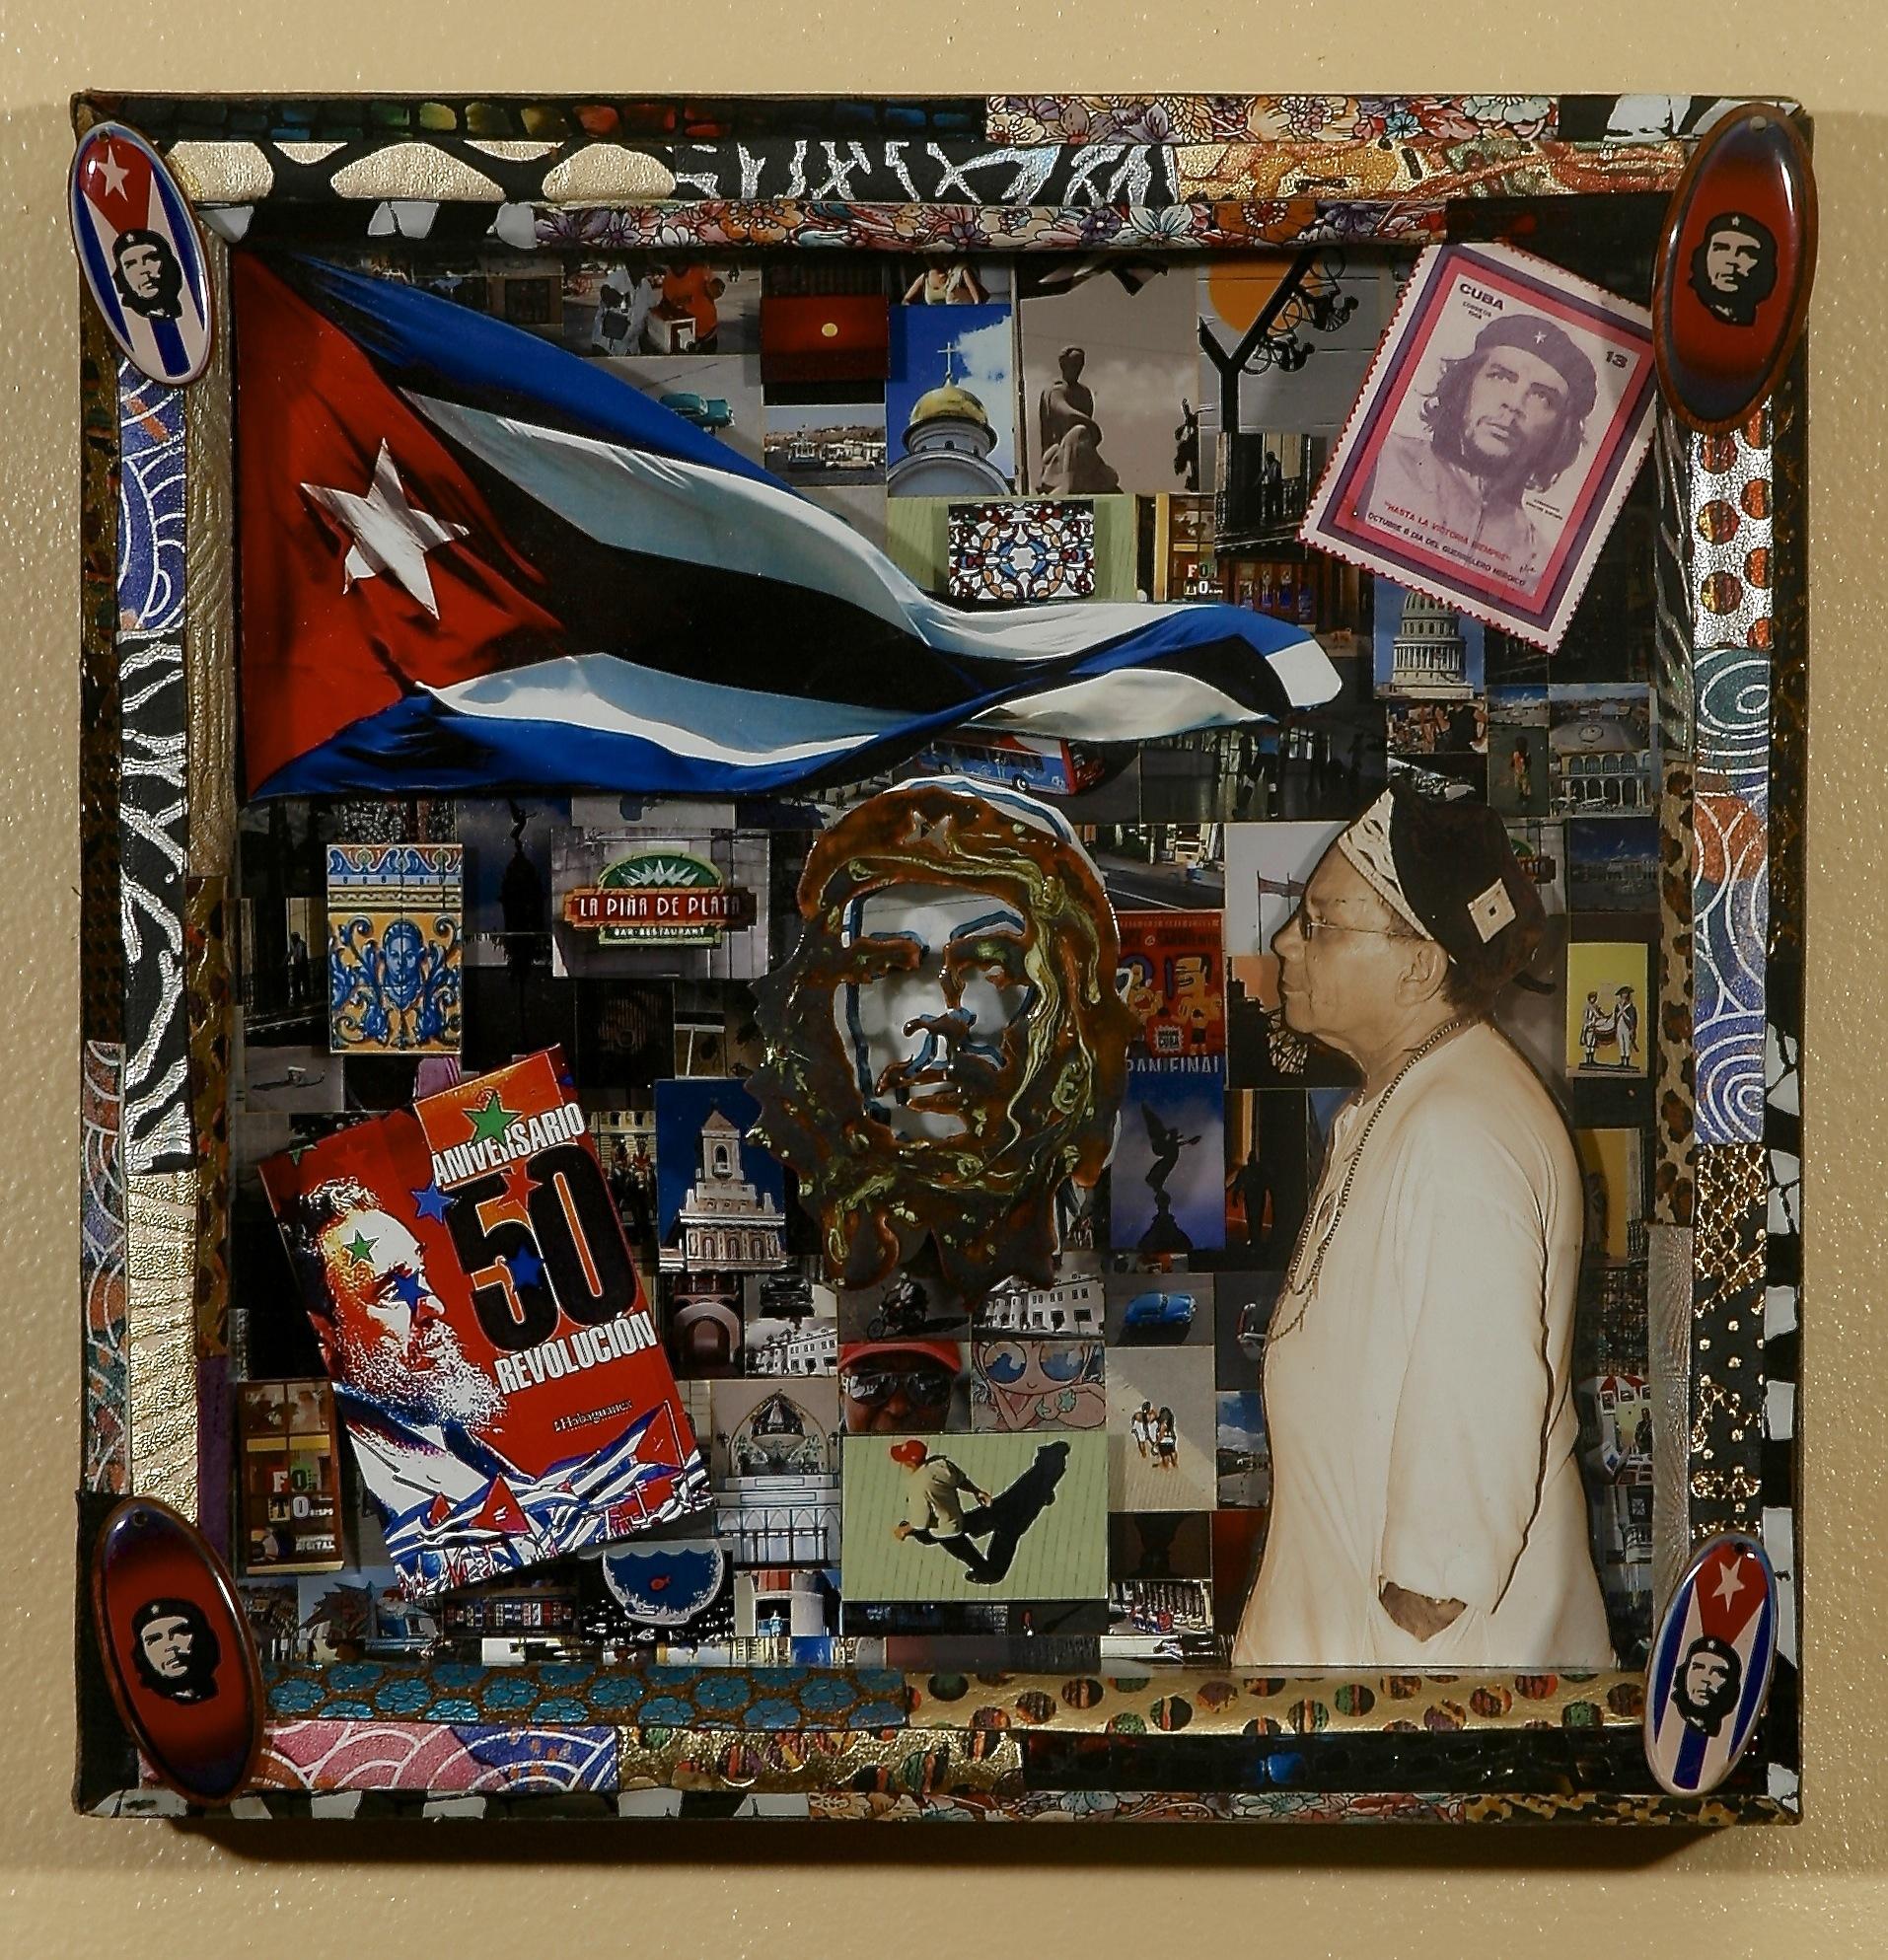 FROM CUBA WITH LOVE 4 : Tomas Fernandez Lobaino (2009)